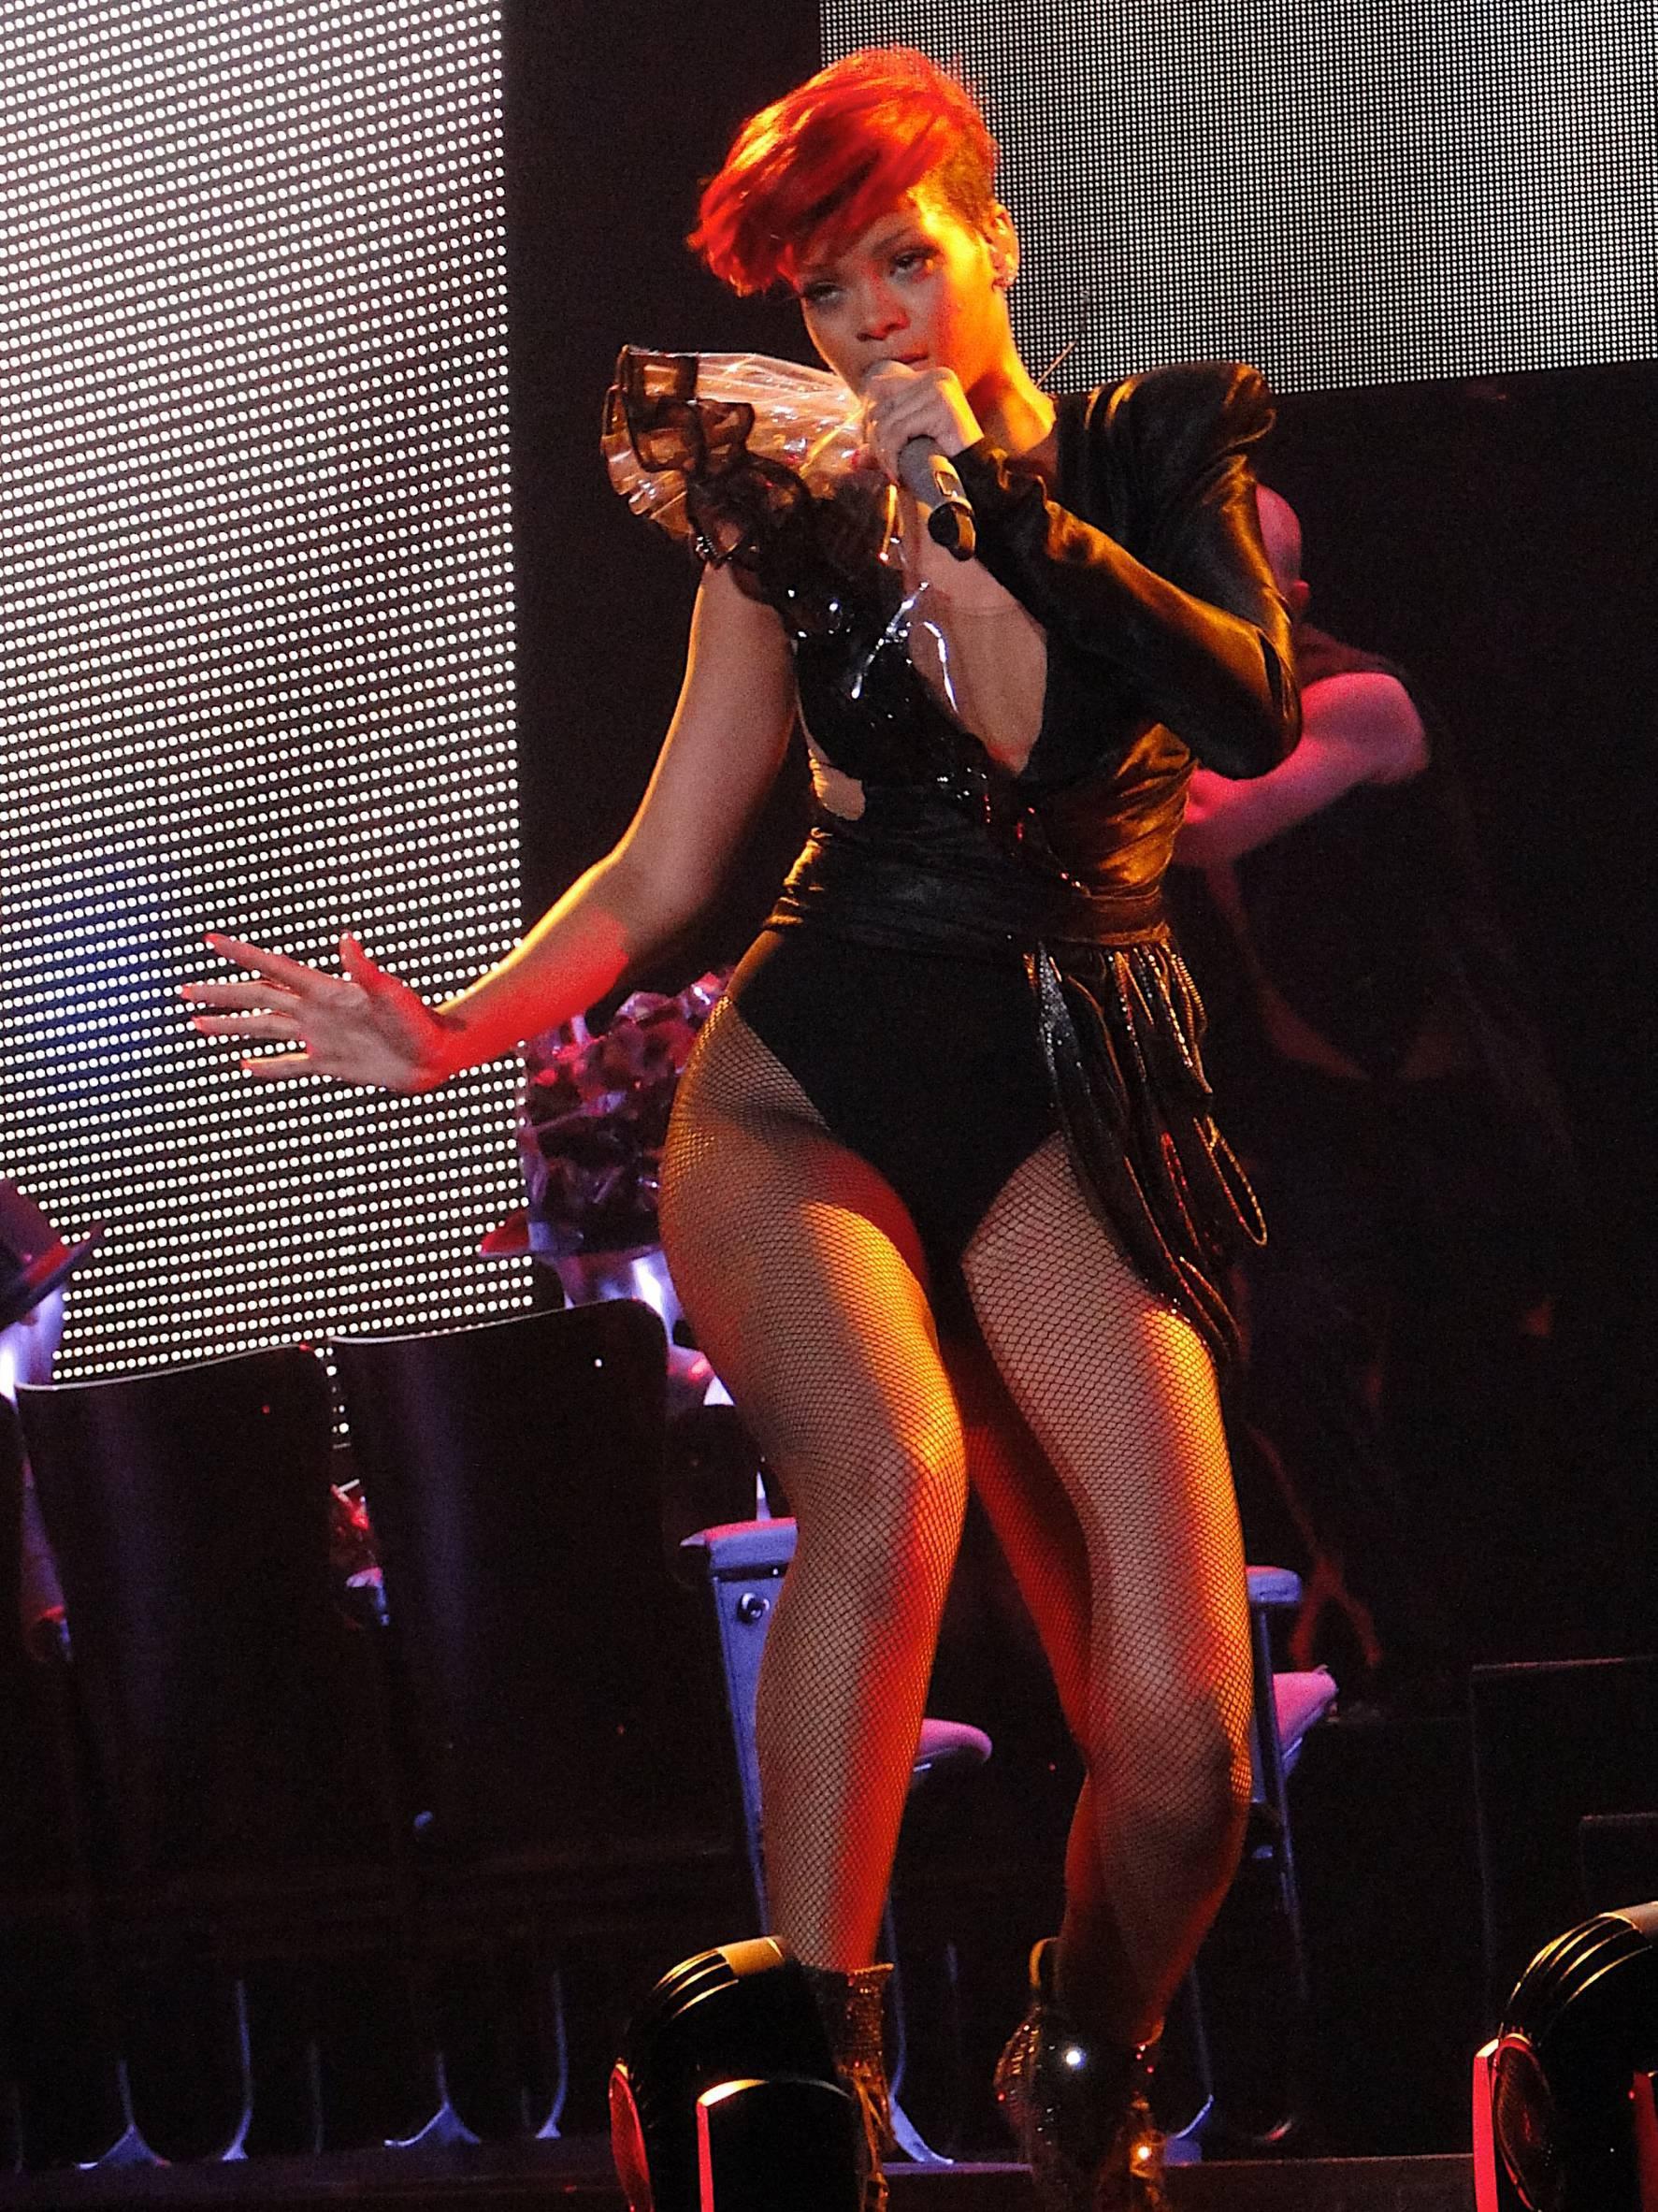 60921_RihannaperformsliveinSacramento.com_TheElder_Rihanna2010_07_09_performsliveinSacramento8_122_493lo.jpg